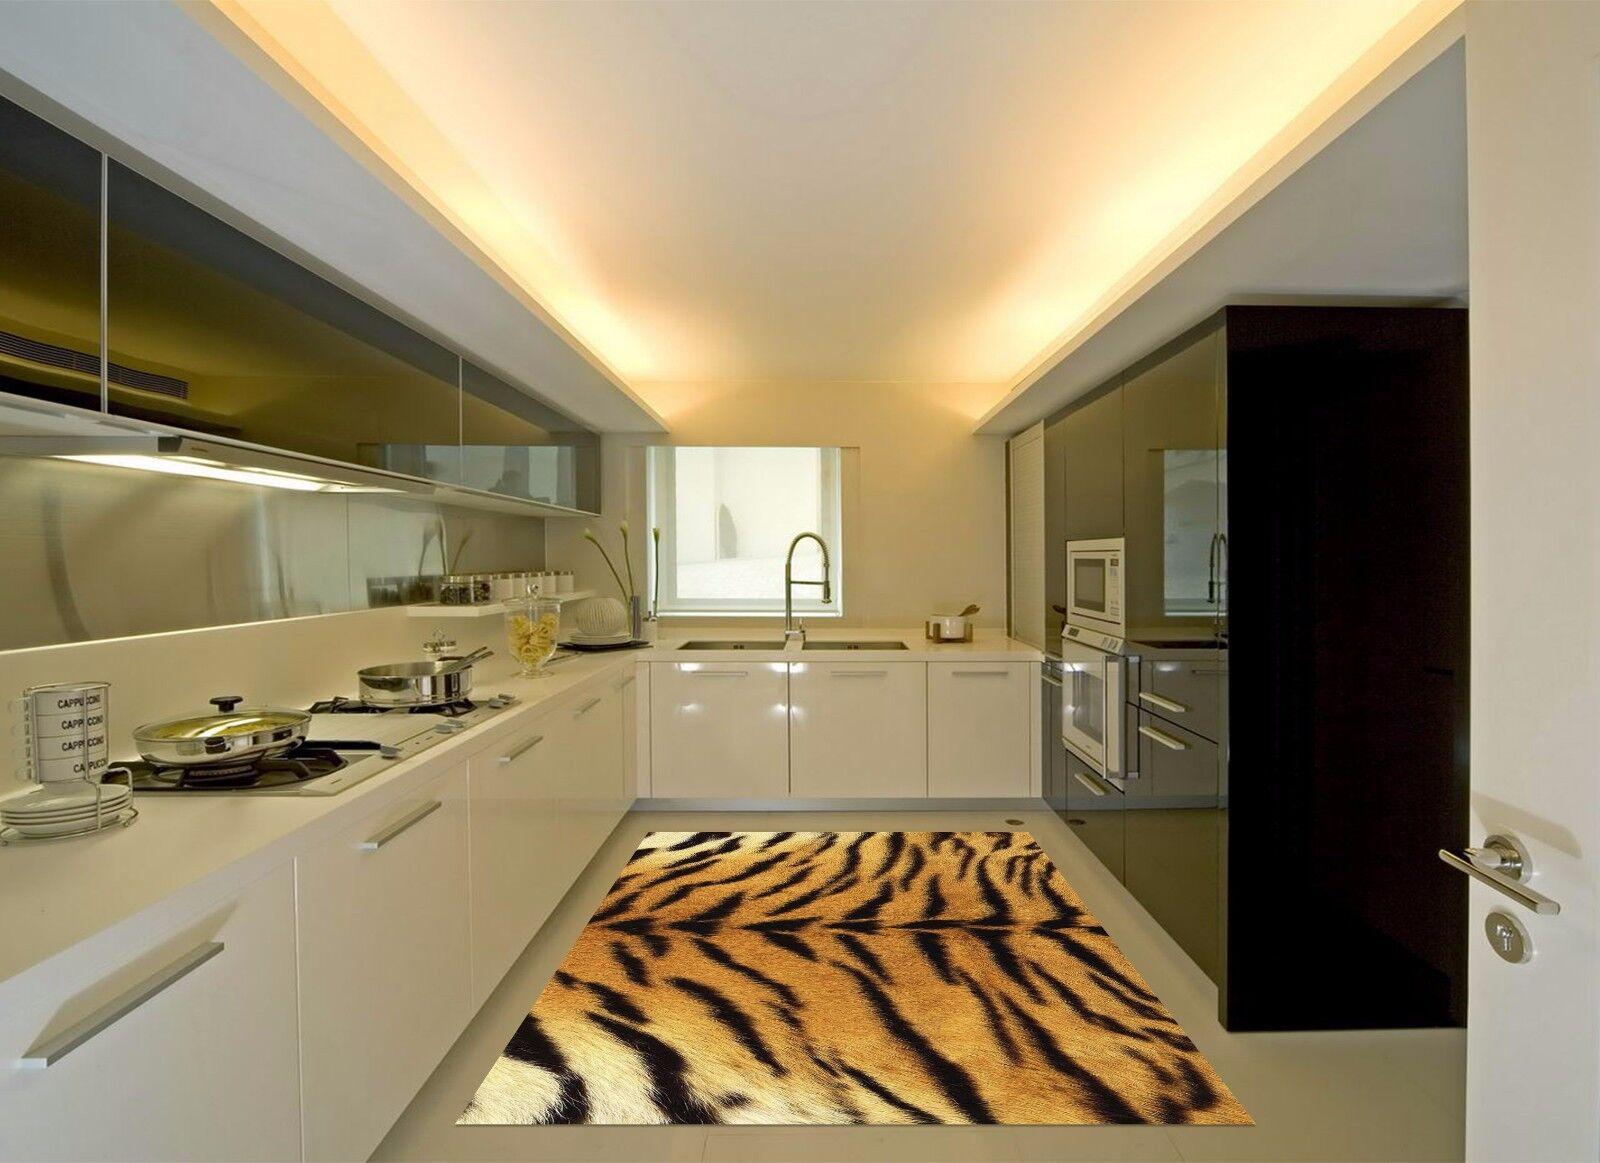 3D Tiger Pattern 9 Kitchen Mat Floor Murals Wall Print Wall AJ WALLPAPER UK Kyra